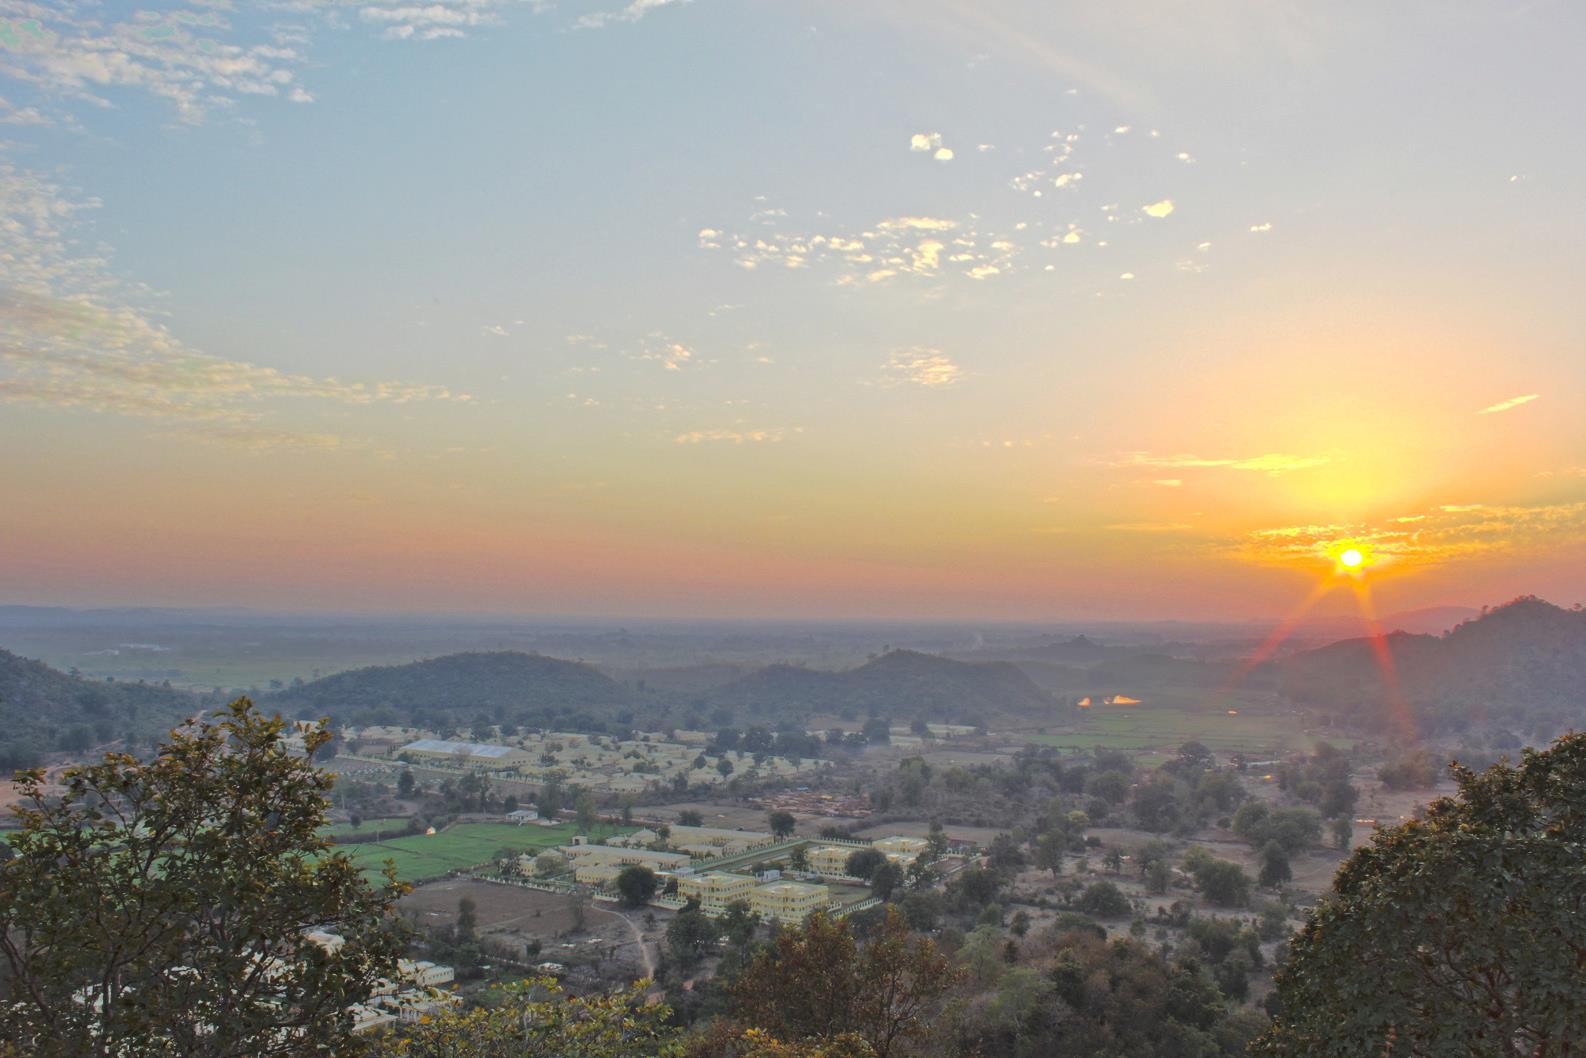 Brahmasthan sunset